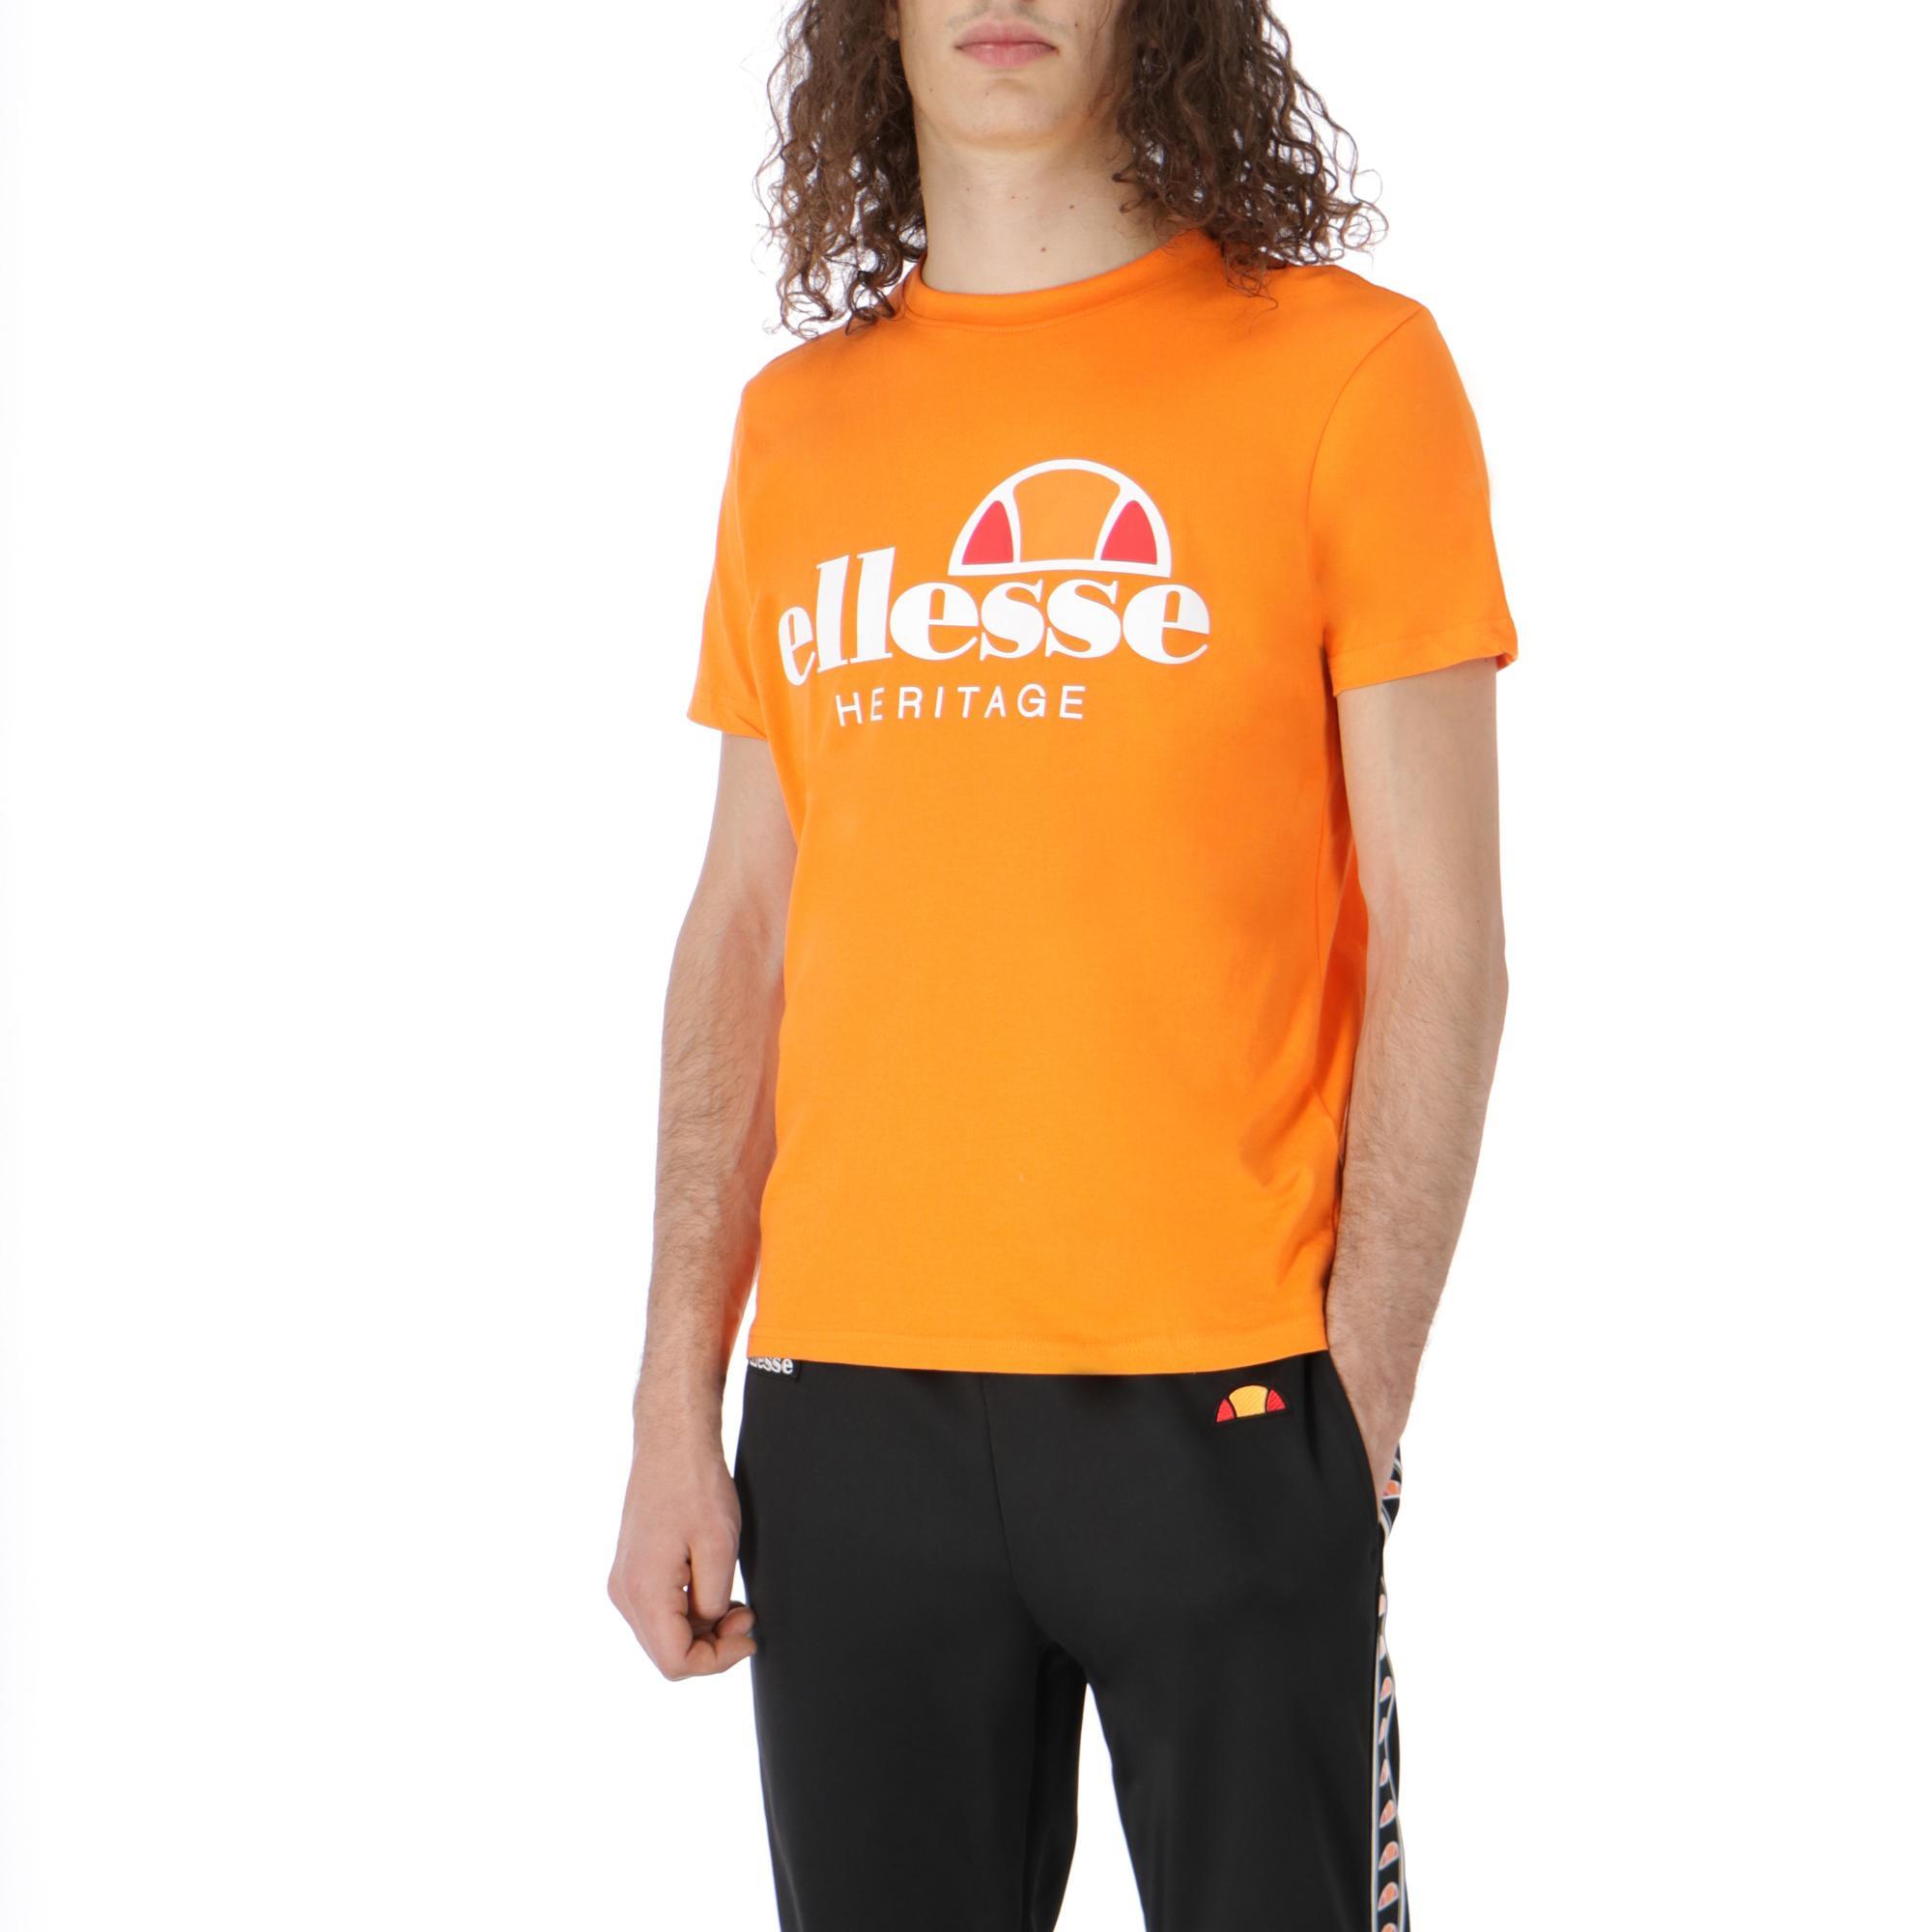 3b07f83a396 Ellesse Logo T-shirt<br/> Orange | Treesse